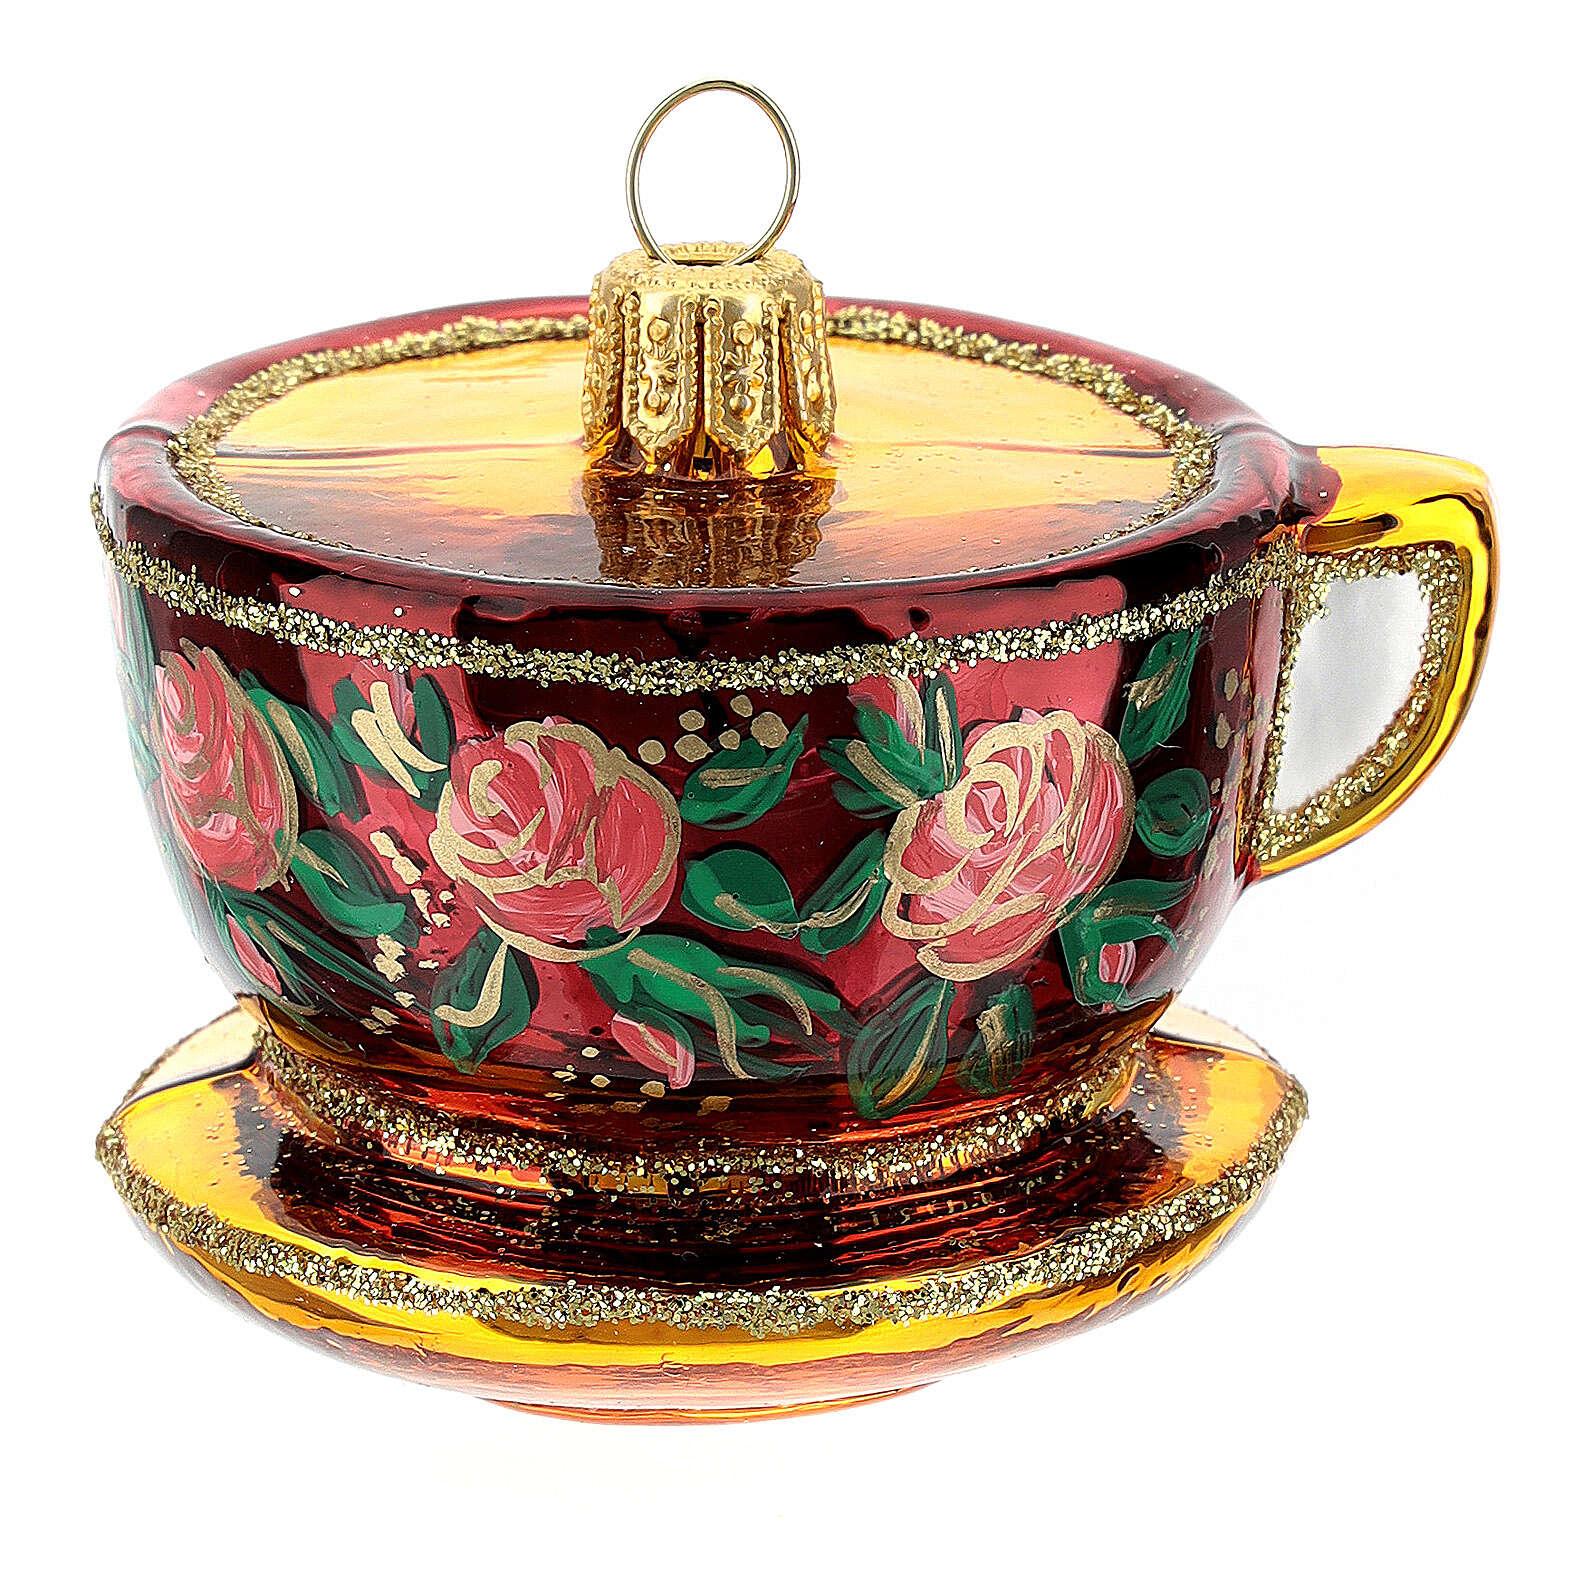 Blown glass Christmas ornament, ornate tea cup 4